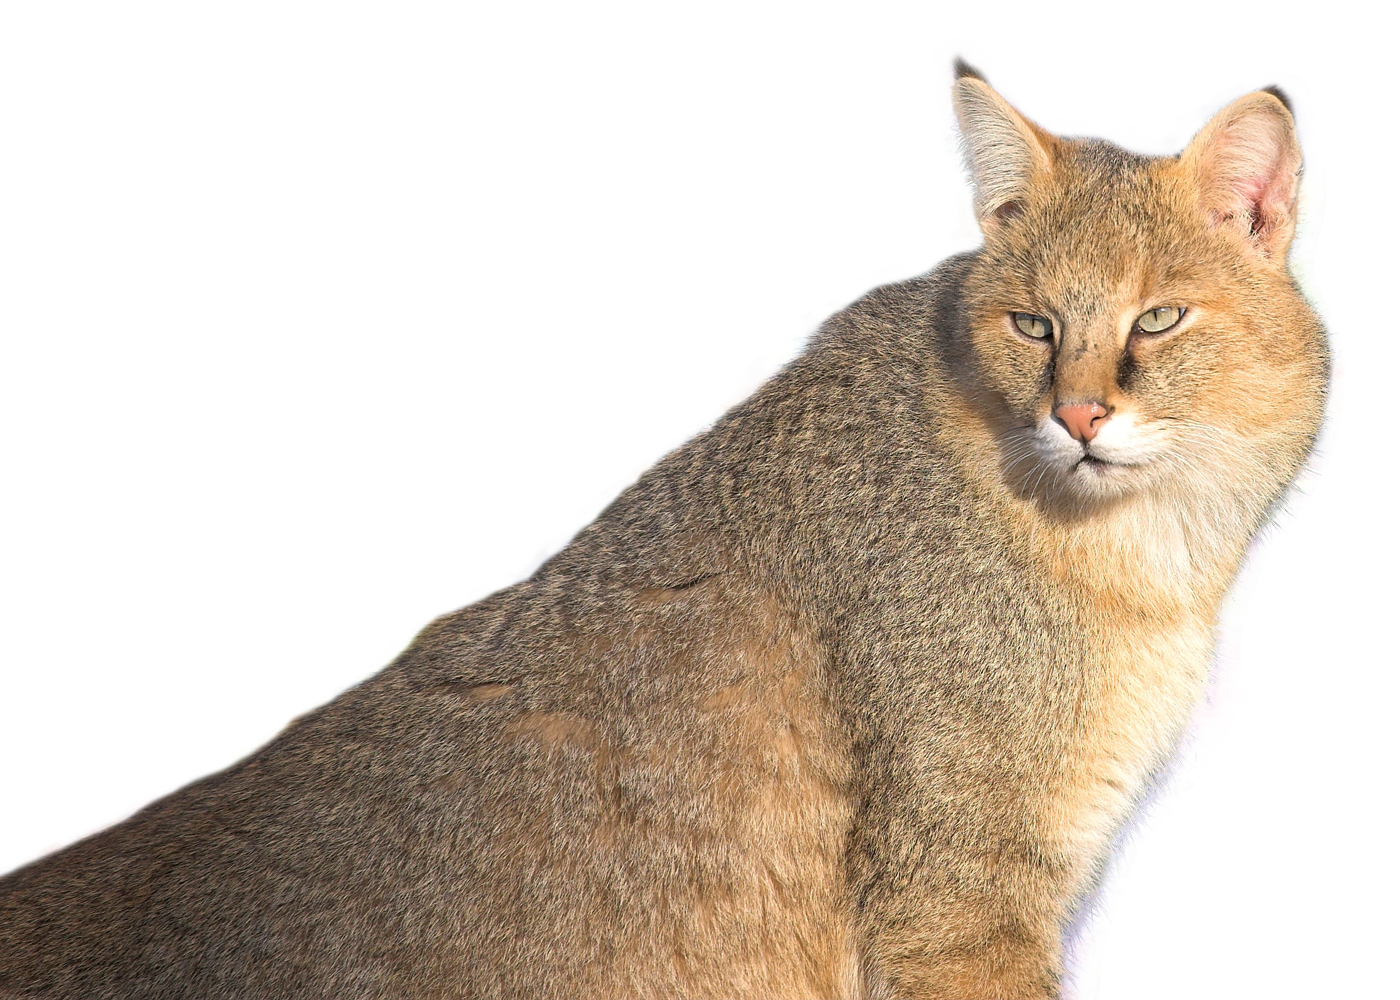 Jungle Cat PNG Image.